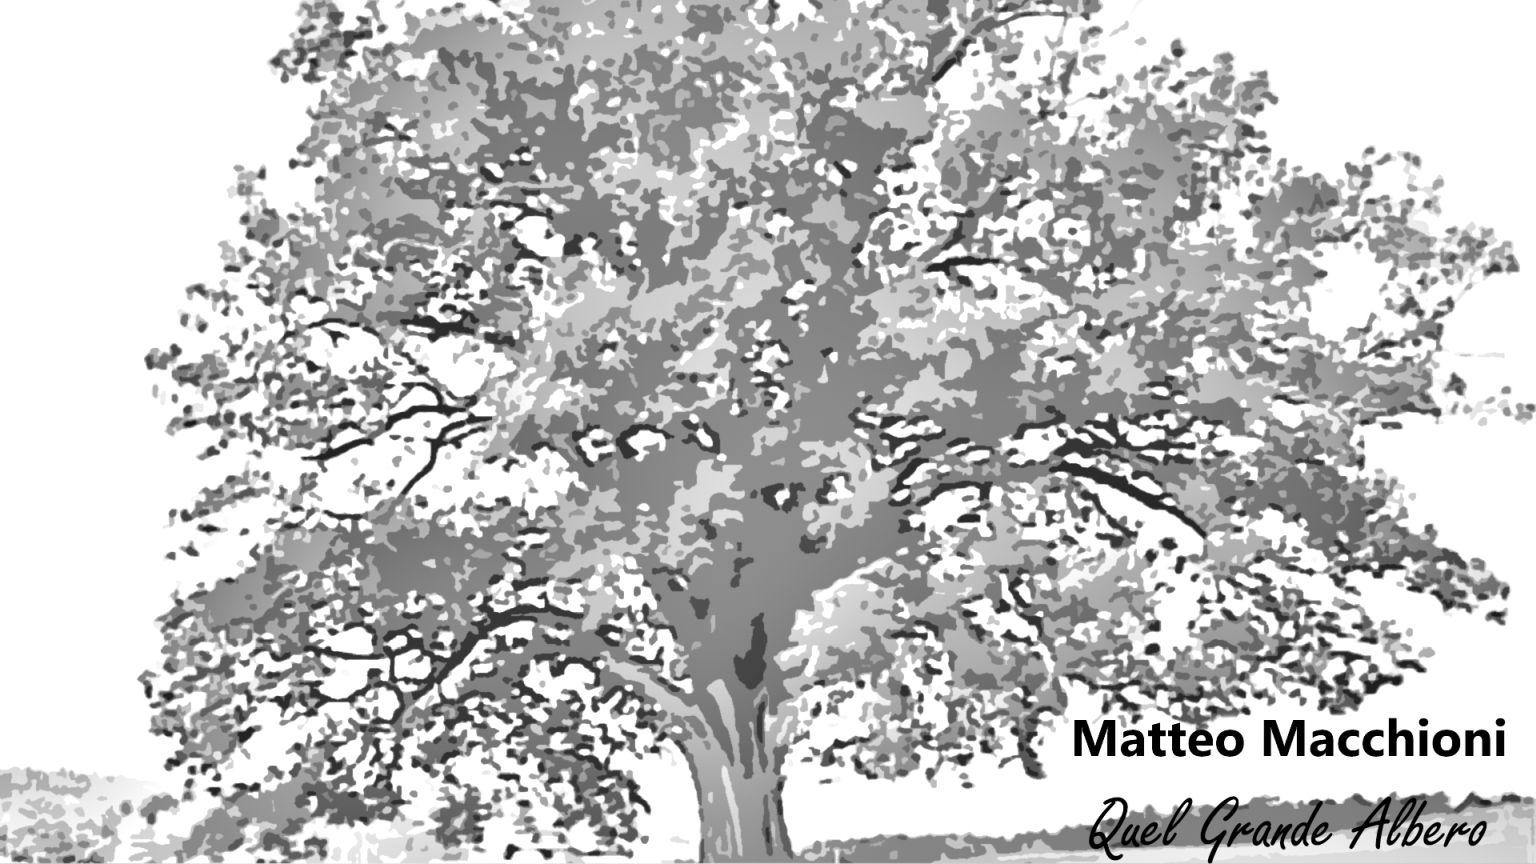 MATTEO MACCHIONI: esce